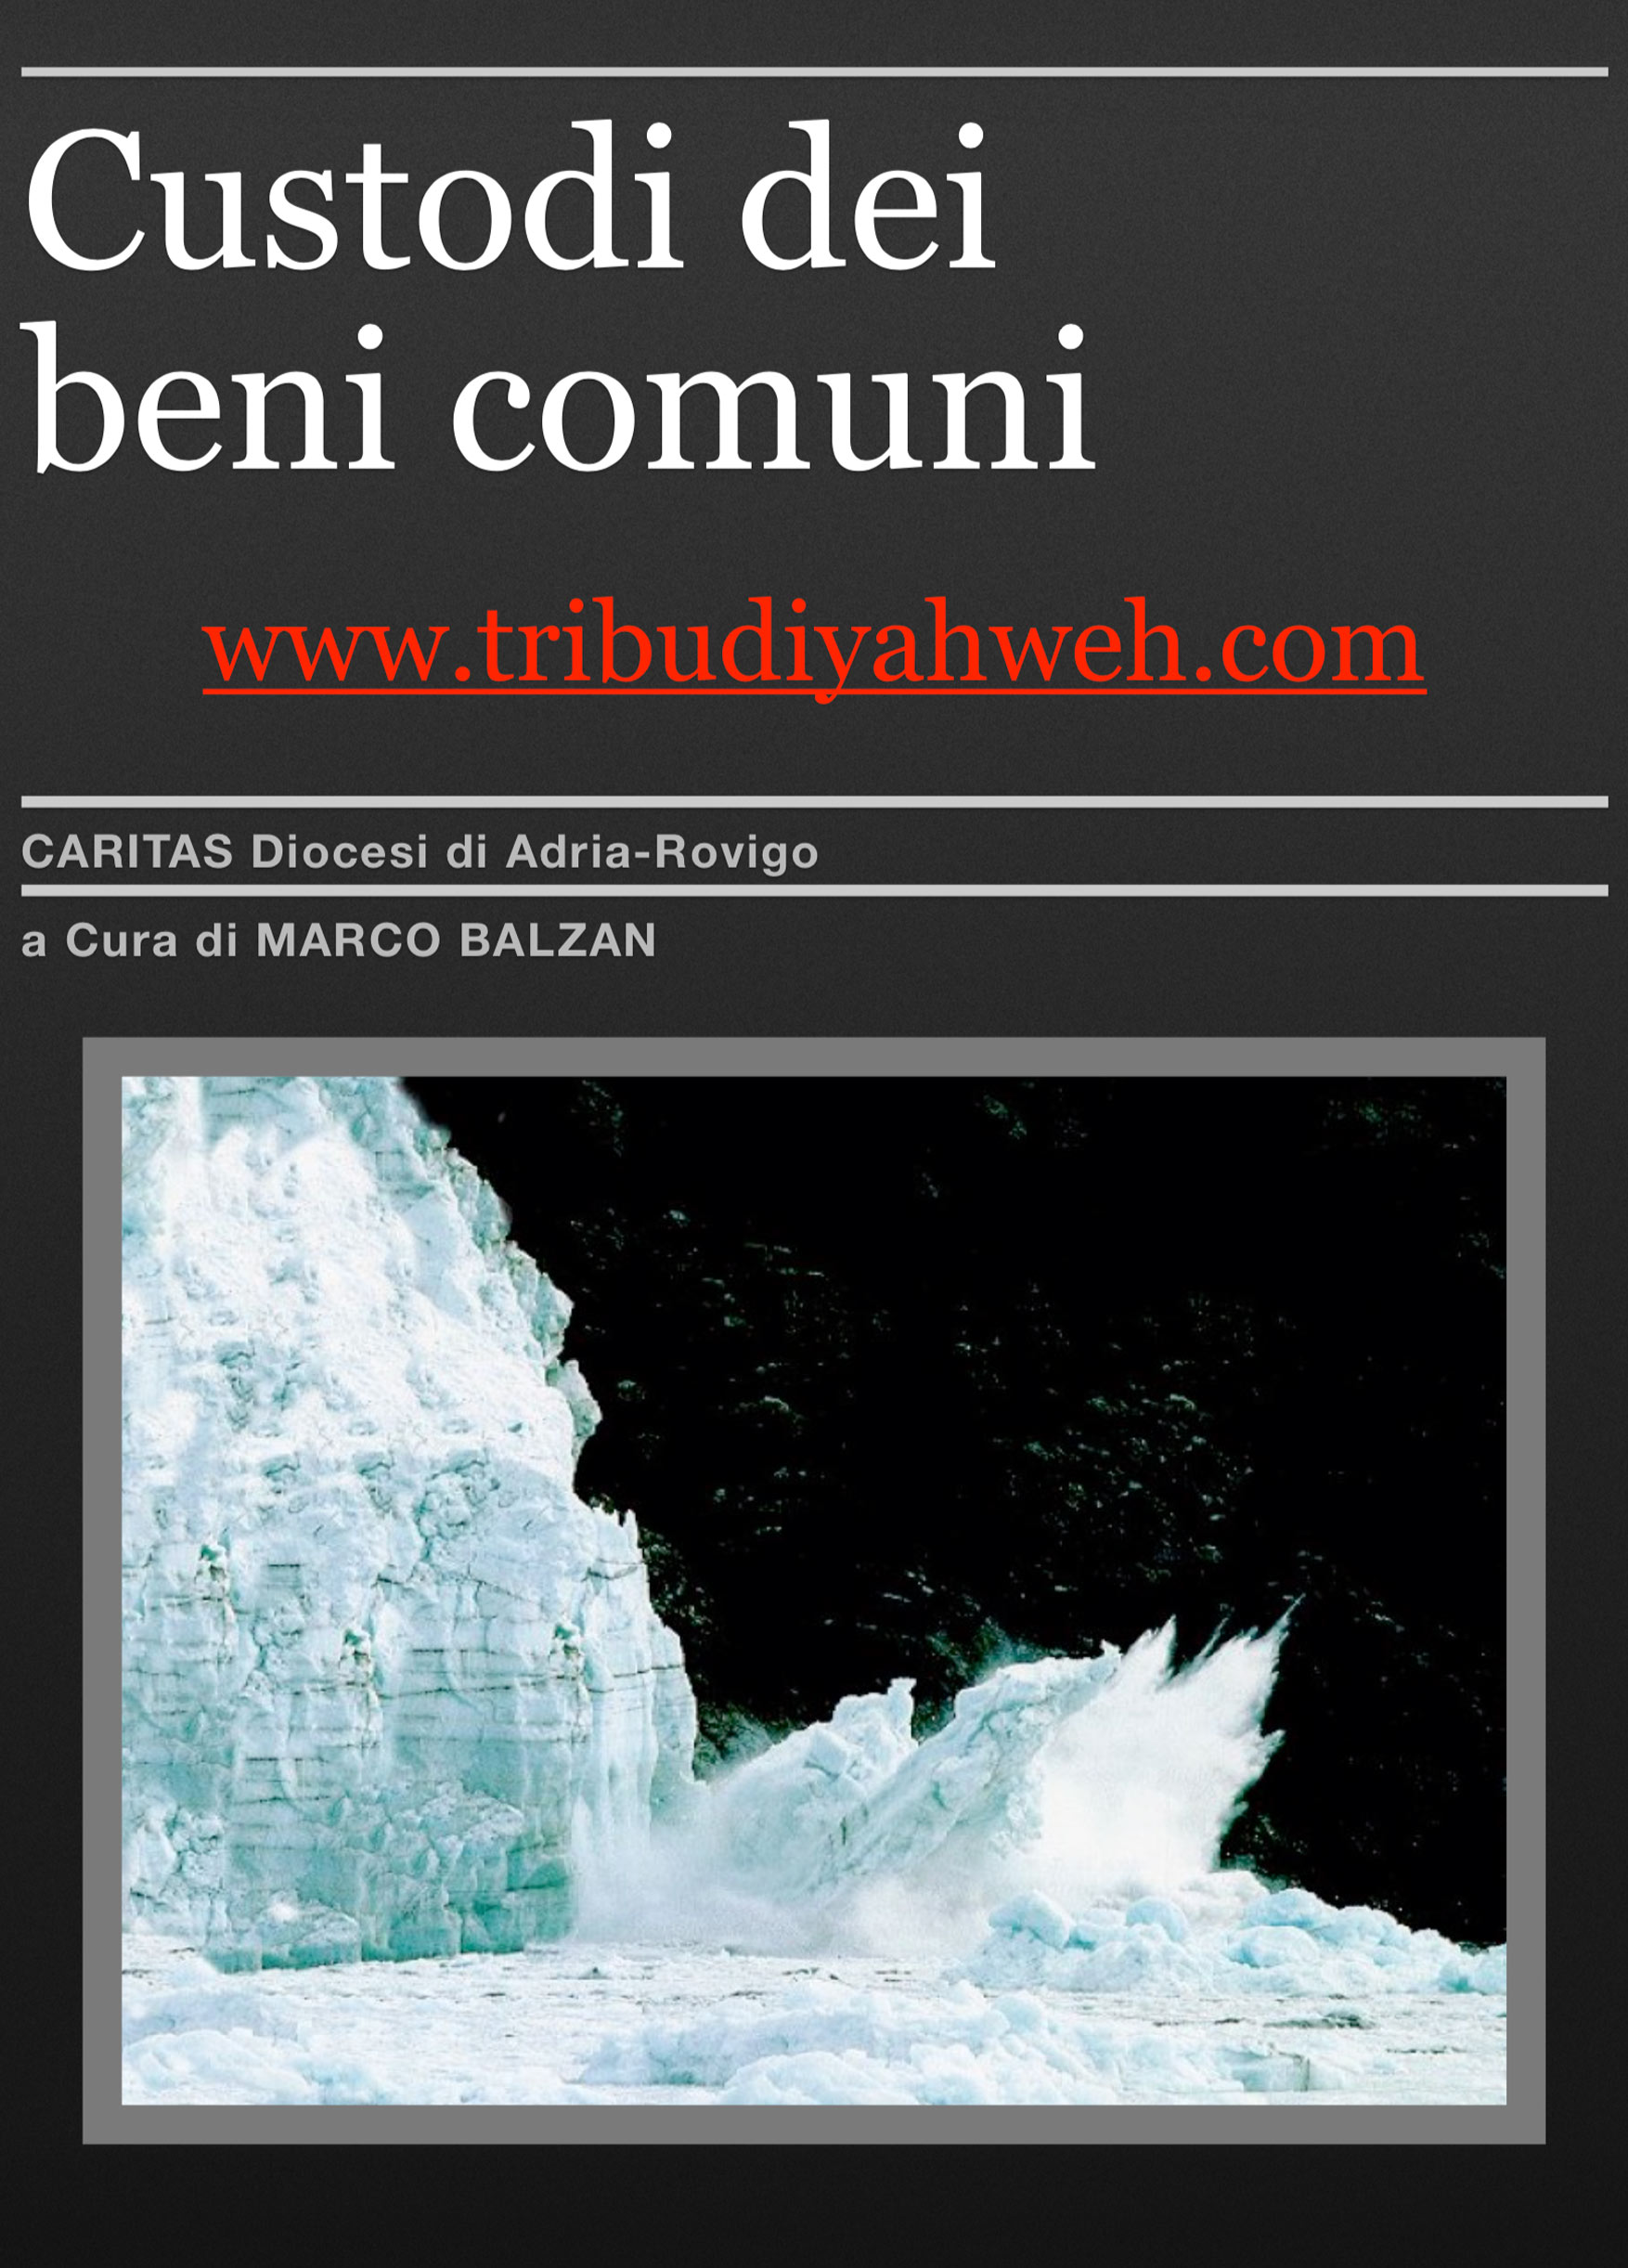 https://www.tribudiyahweh.com/wp/wp-content/uploads/2019/04/custodi_beni_comuni.jpg